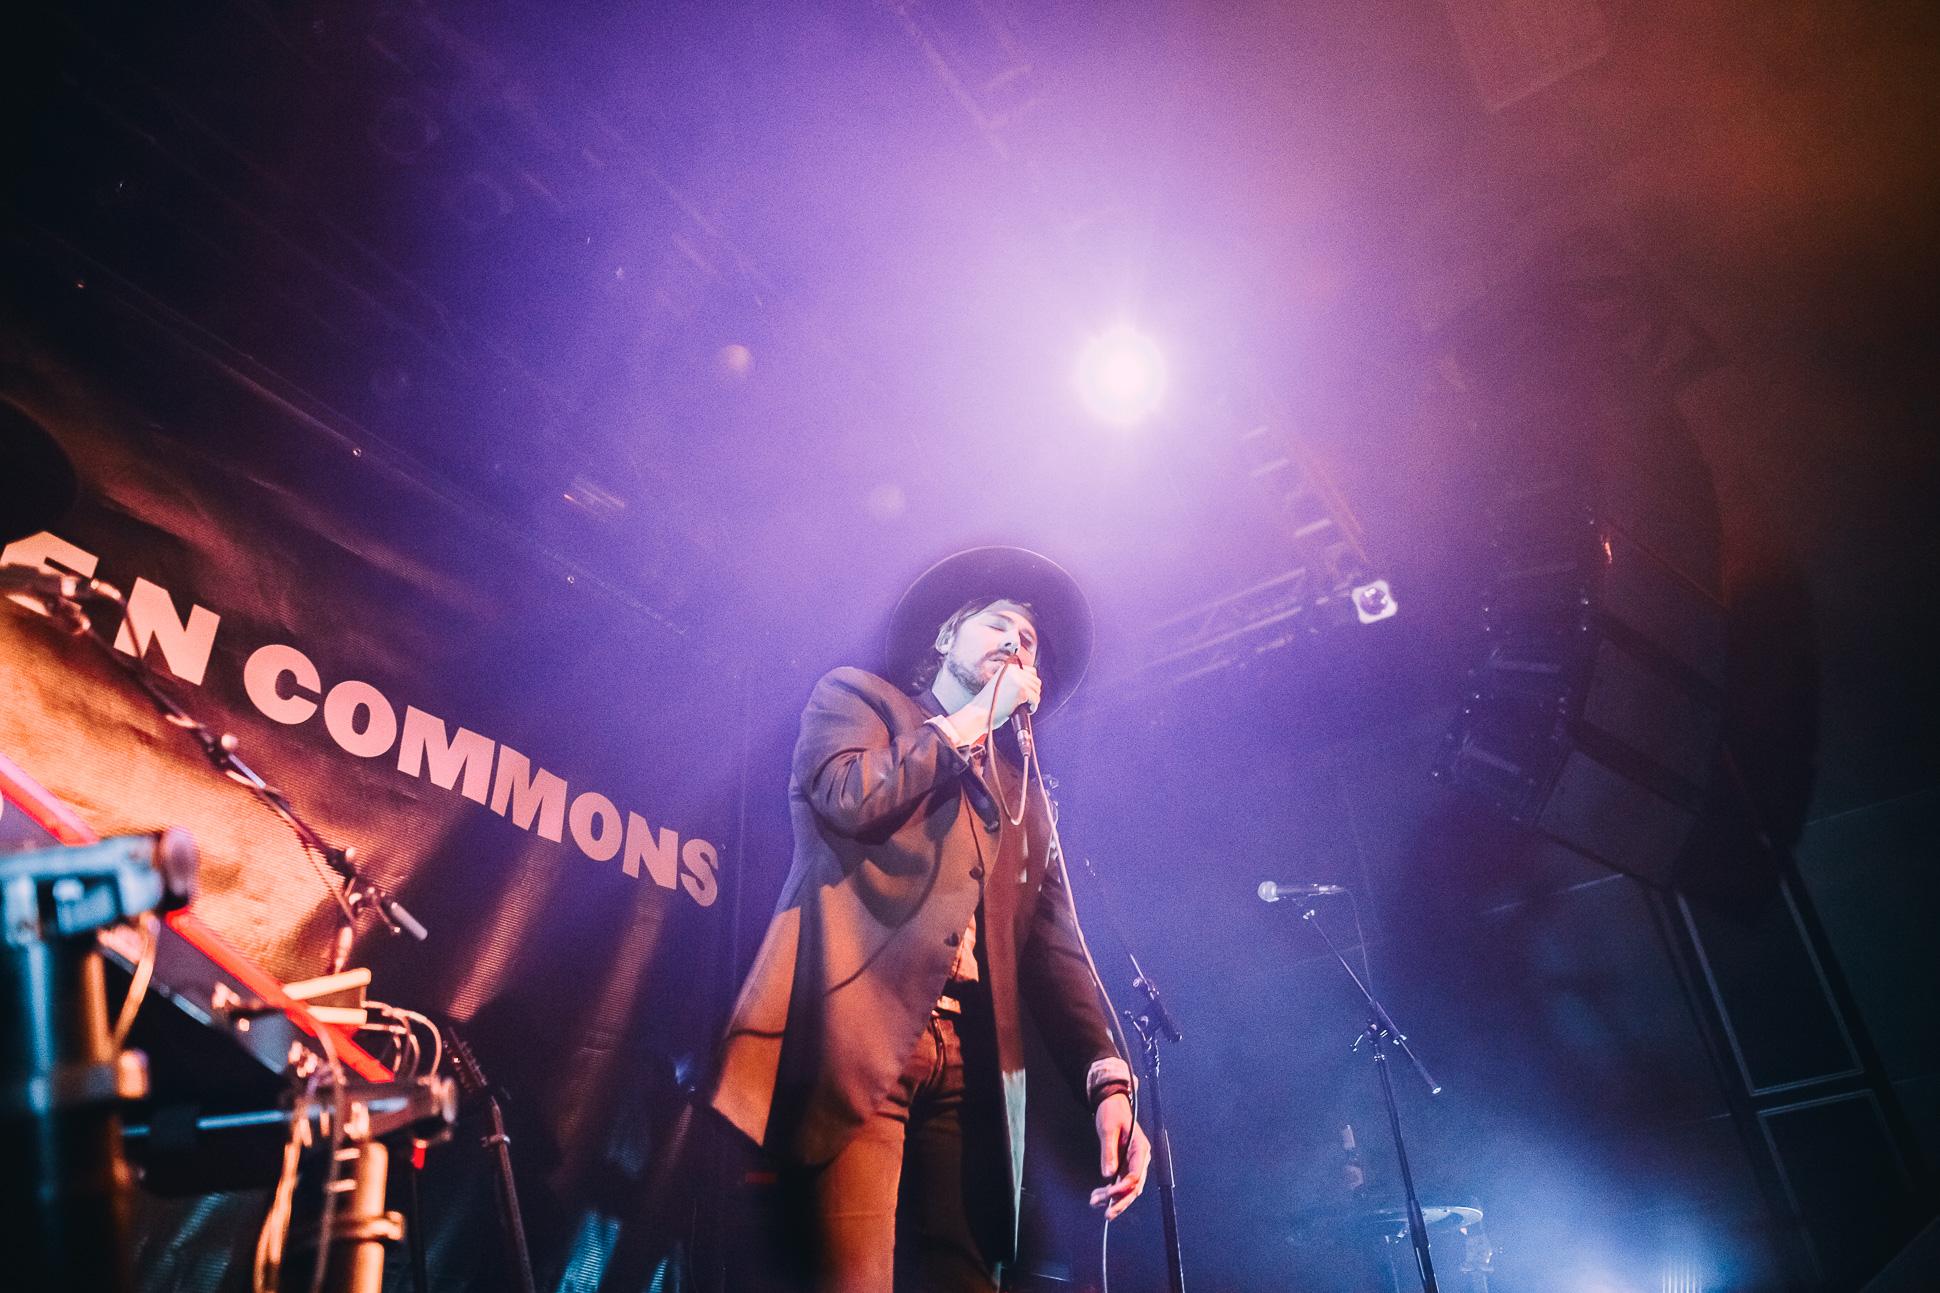 JamieNCommons-VENUE-19-01-2019-Vancouver-13.jpg